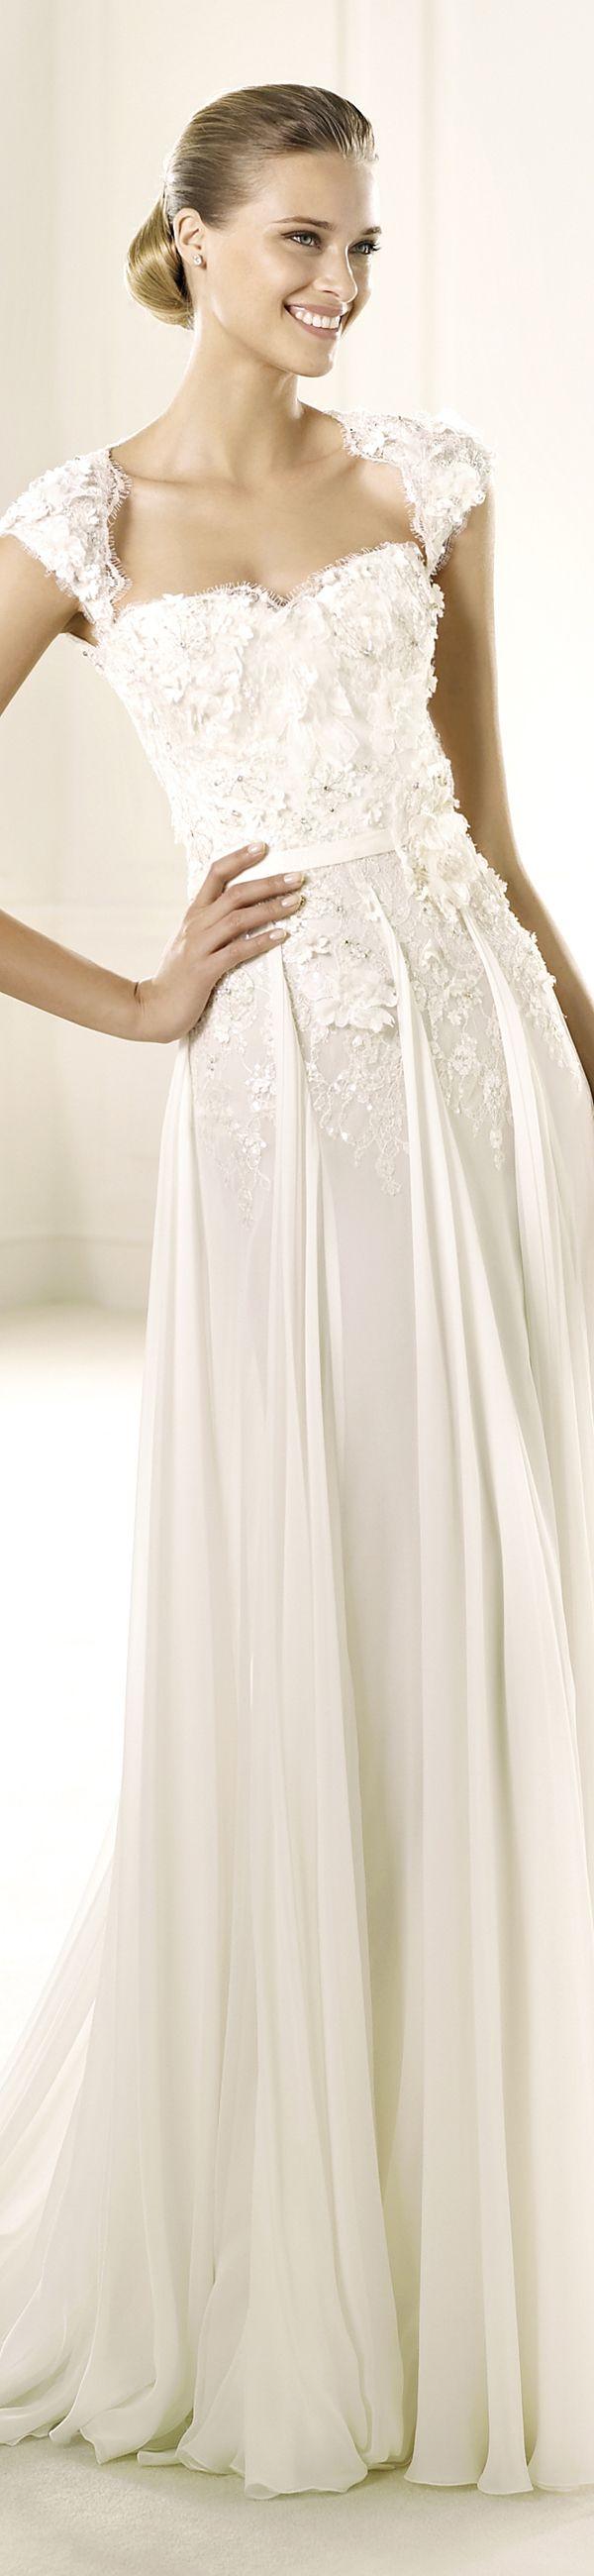 1336 best Best Wedding ideas, wedding dresses, wedding rings ...